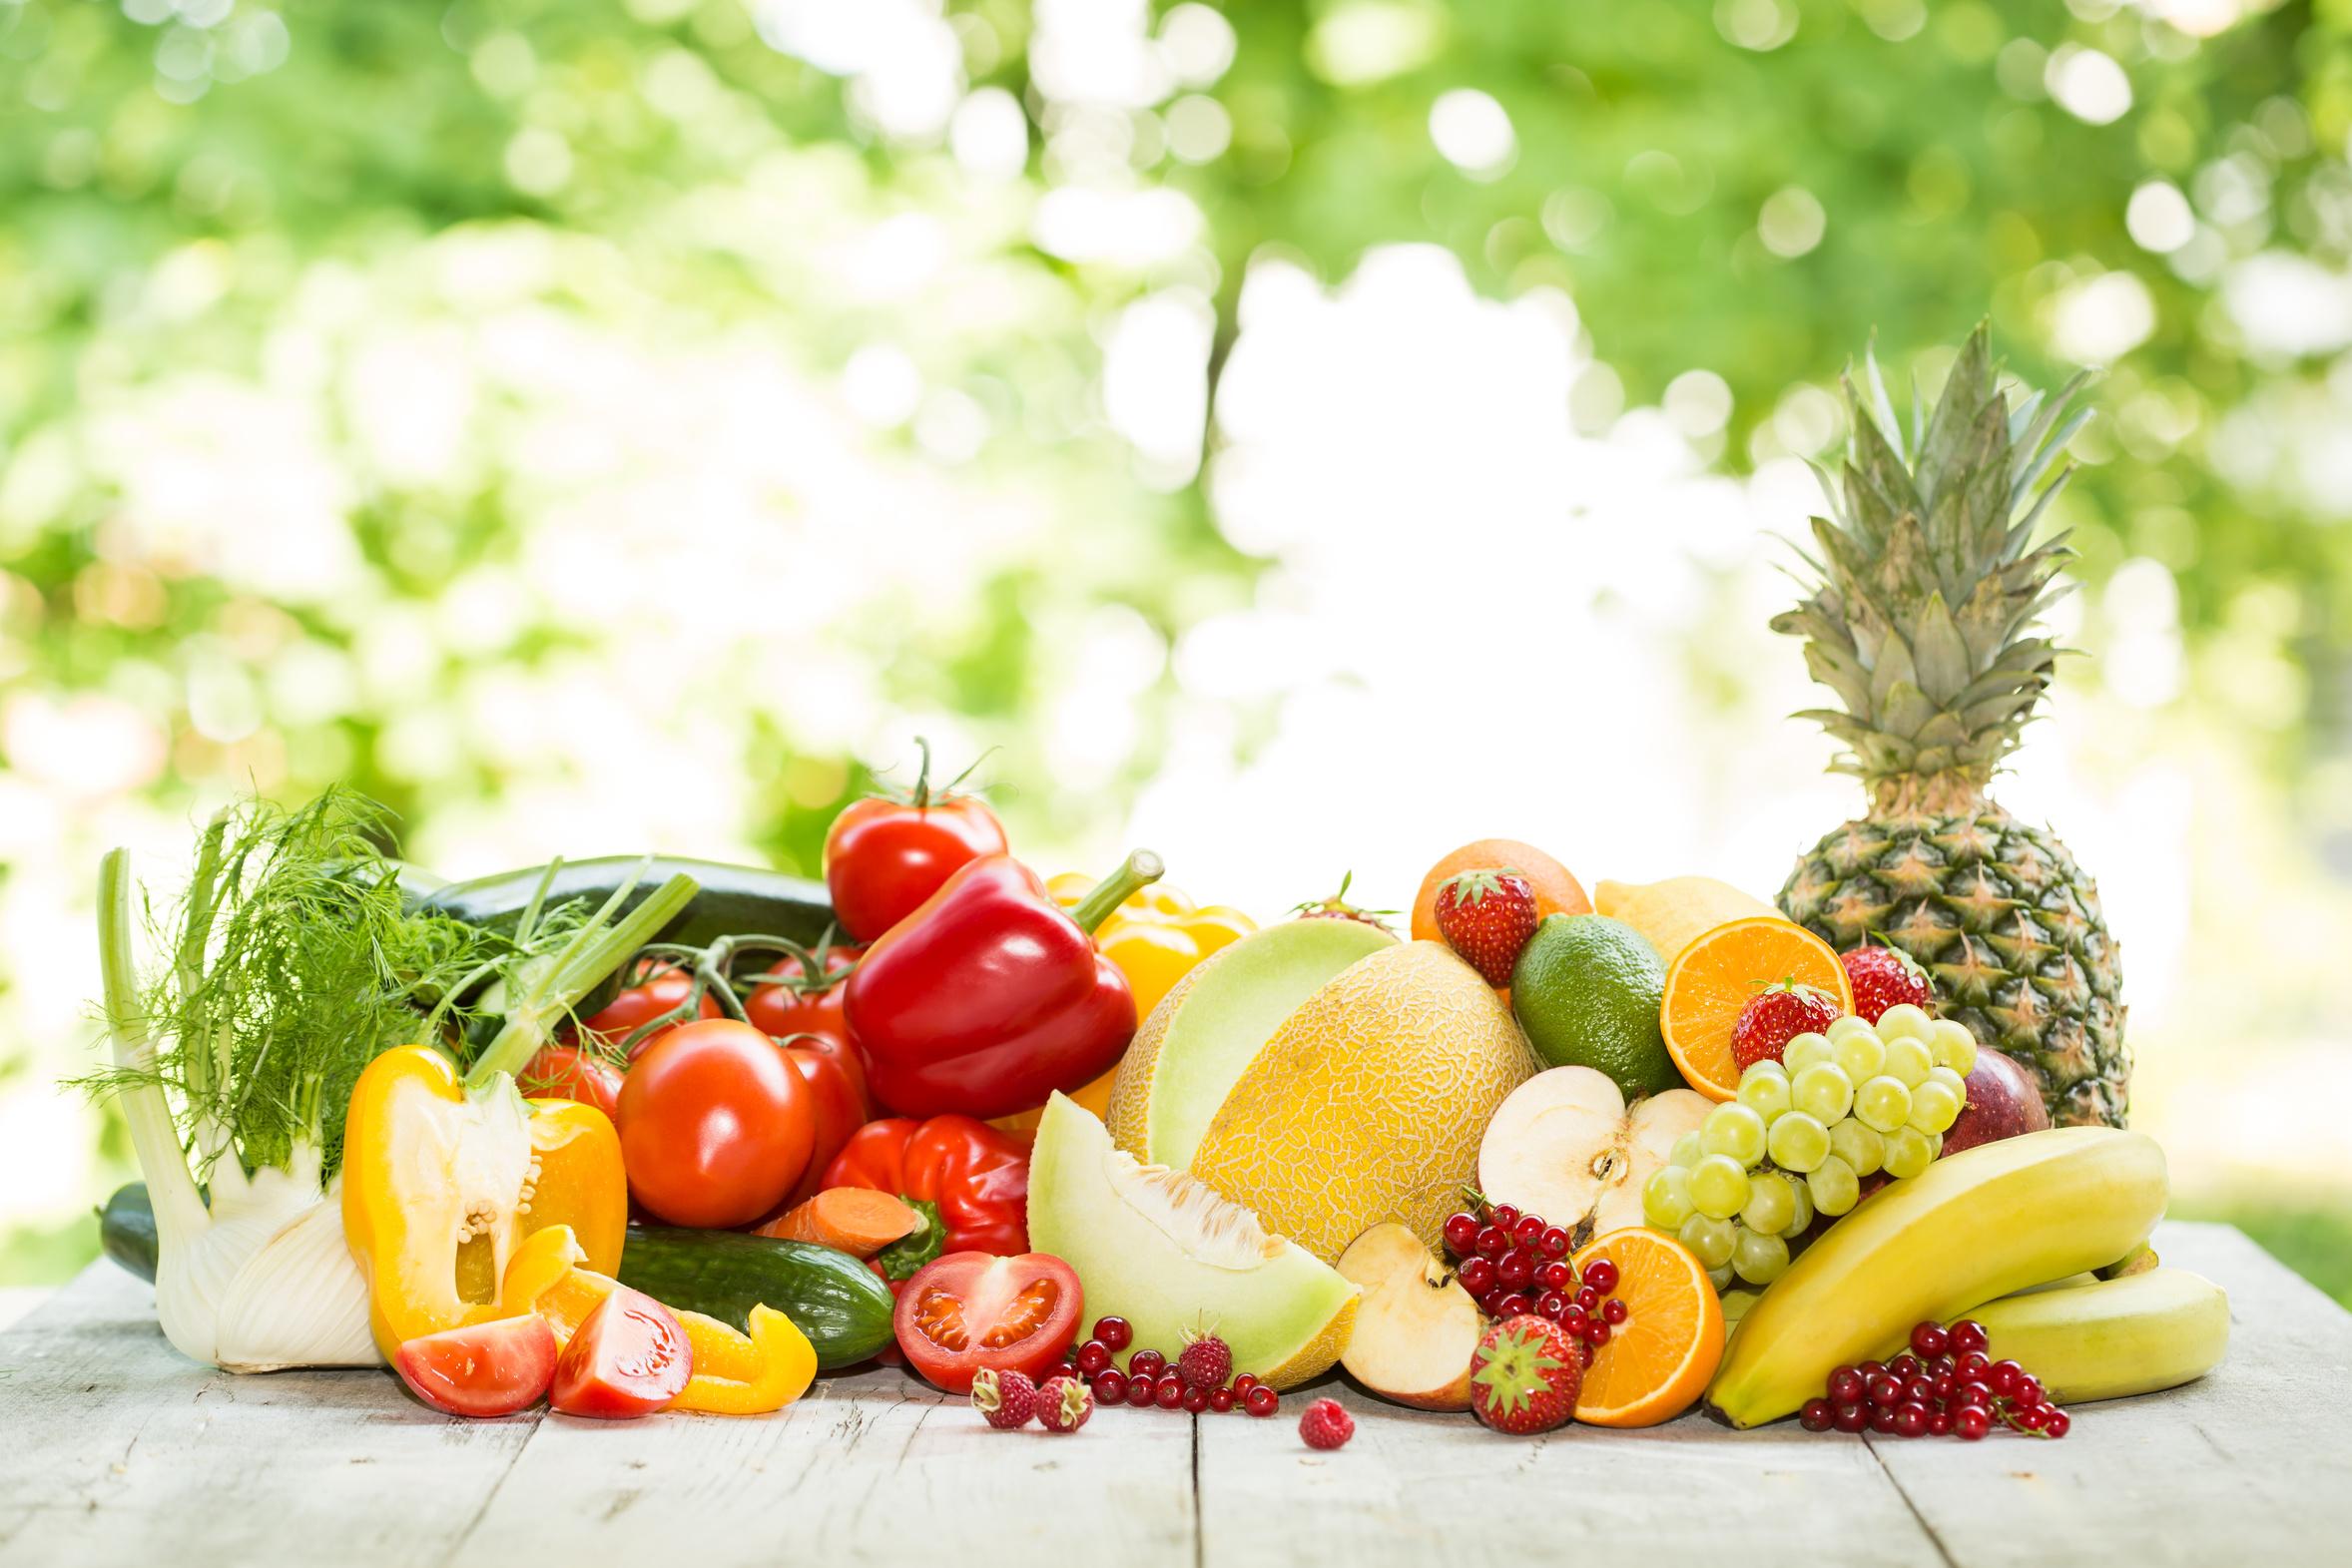 nella pancia: frutta e verdura freschi